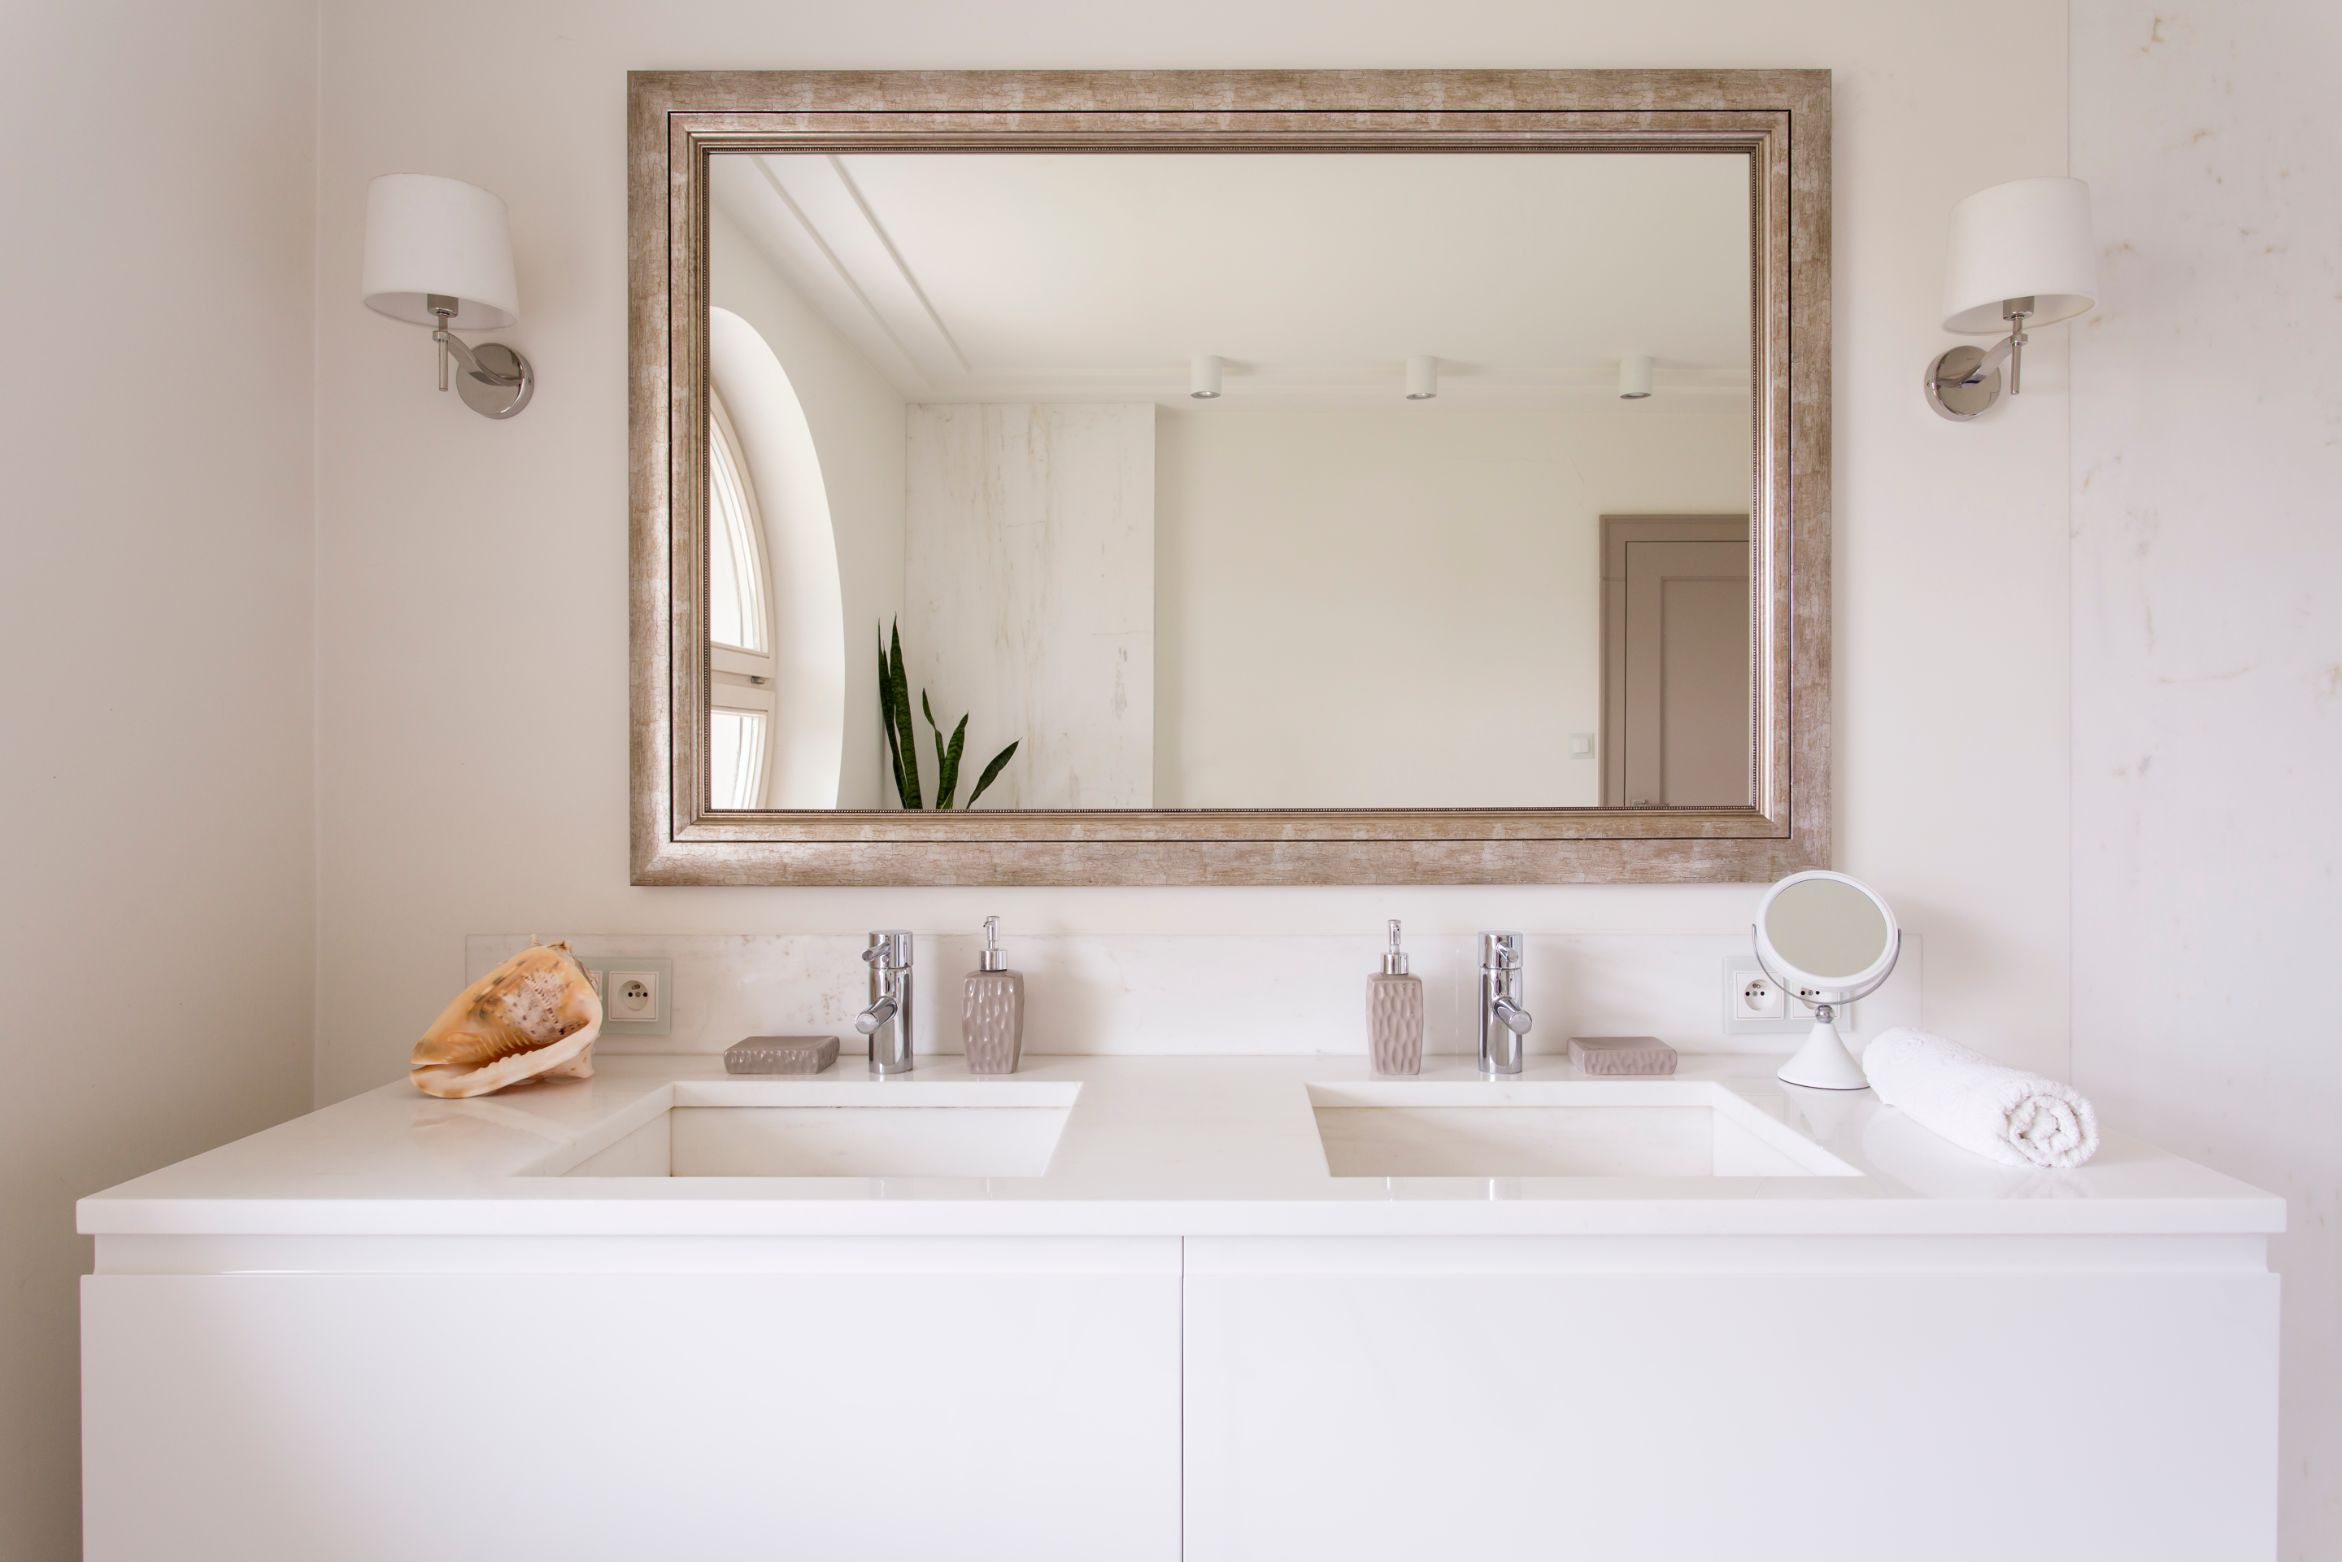 Sink Refinishing Reglaze Porcelain Or Cast Iron Sinks Elmhurst Il